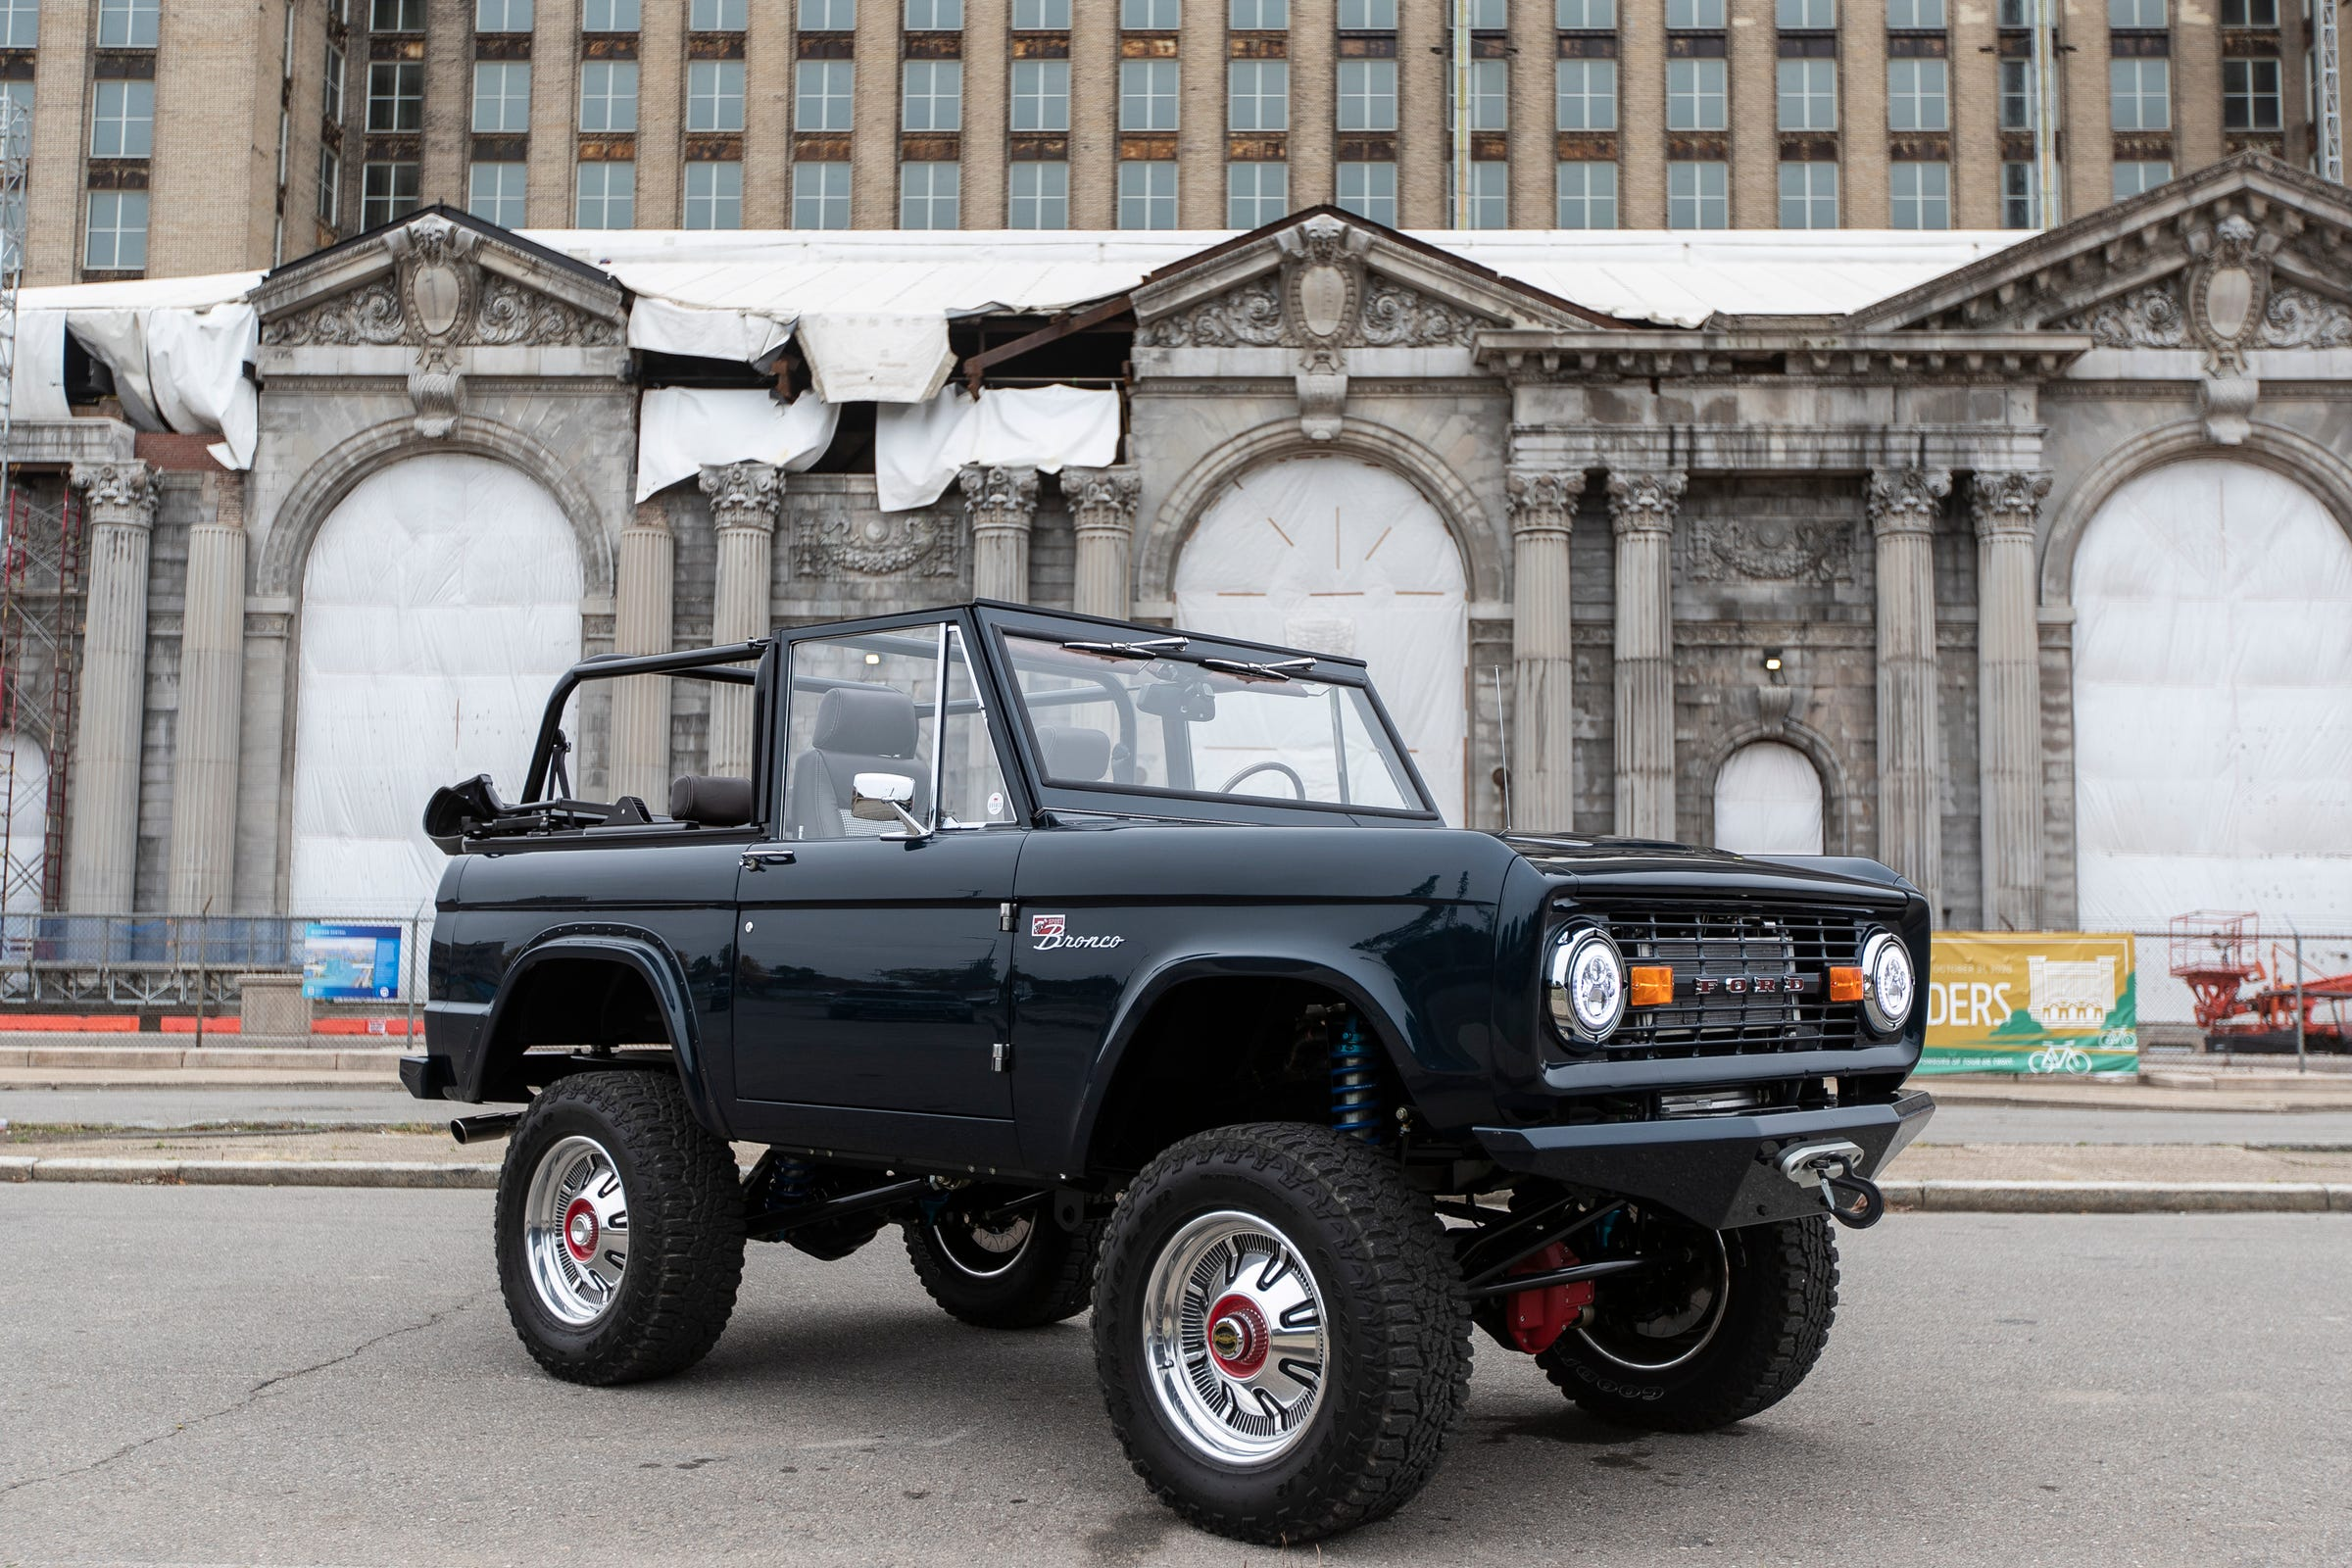 Vintage Ford Broncos being rebuilt, transformed — into something like you've never seen